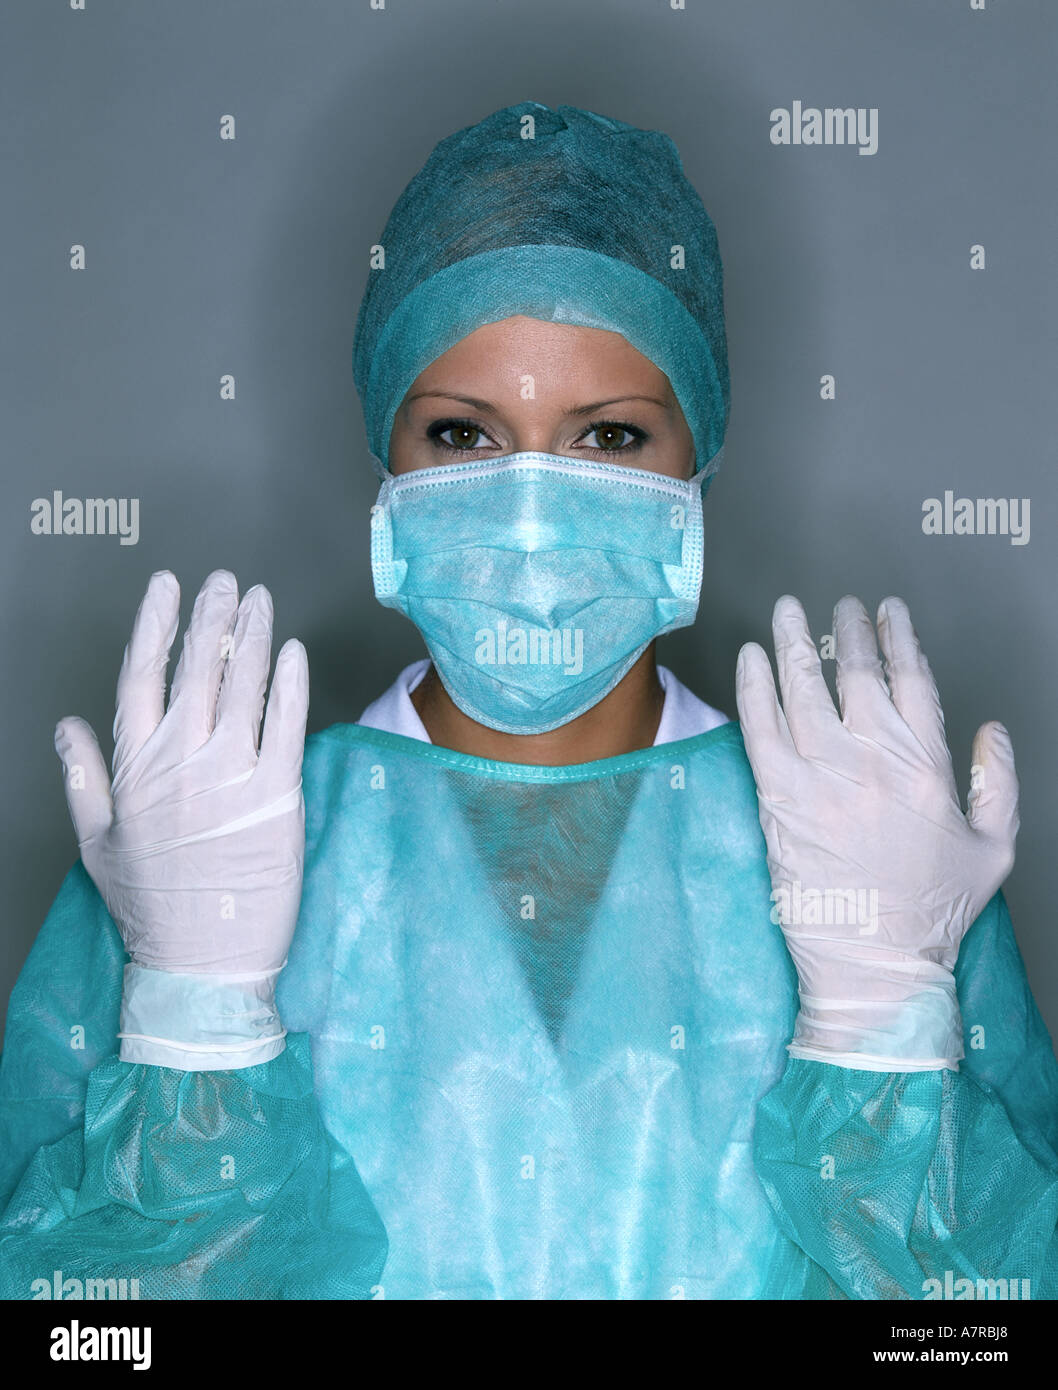 Nurse Mask Gloves Stock Photos & Nurse Mask Gloves Stock Images - Alamy